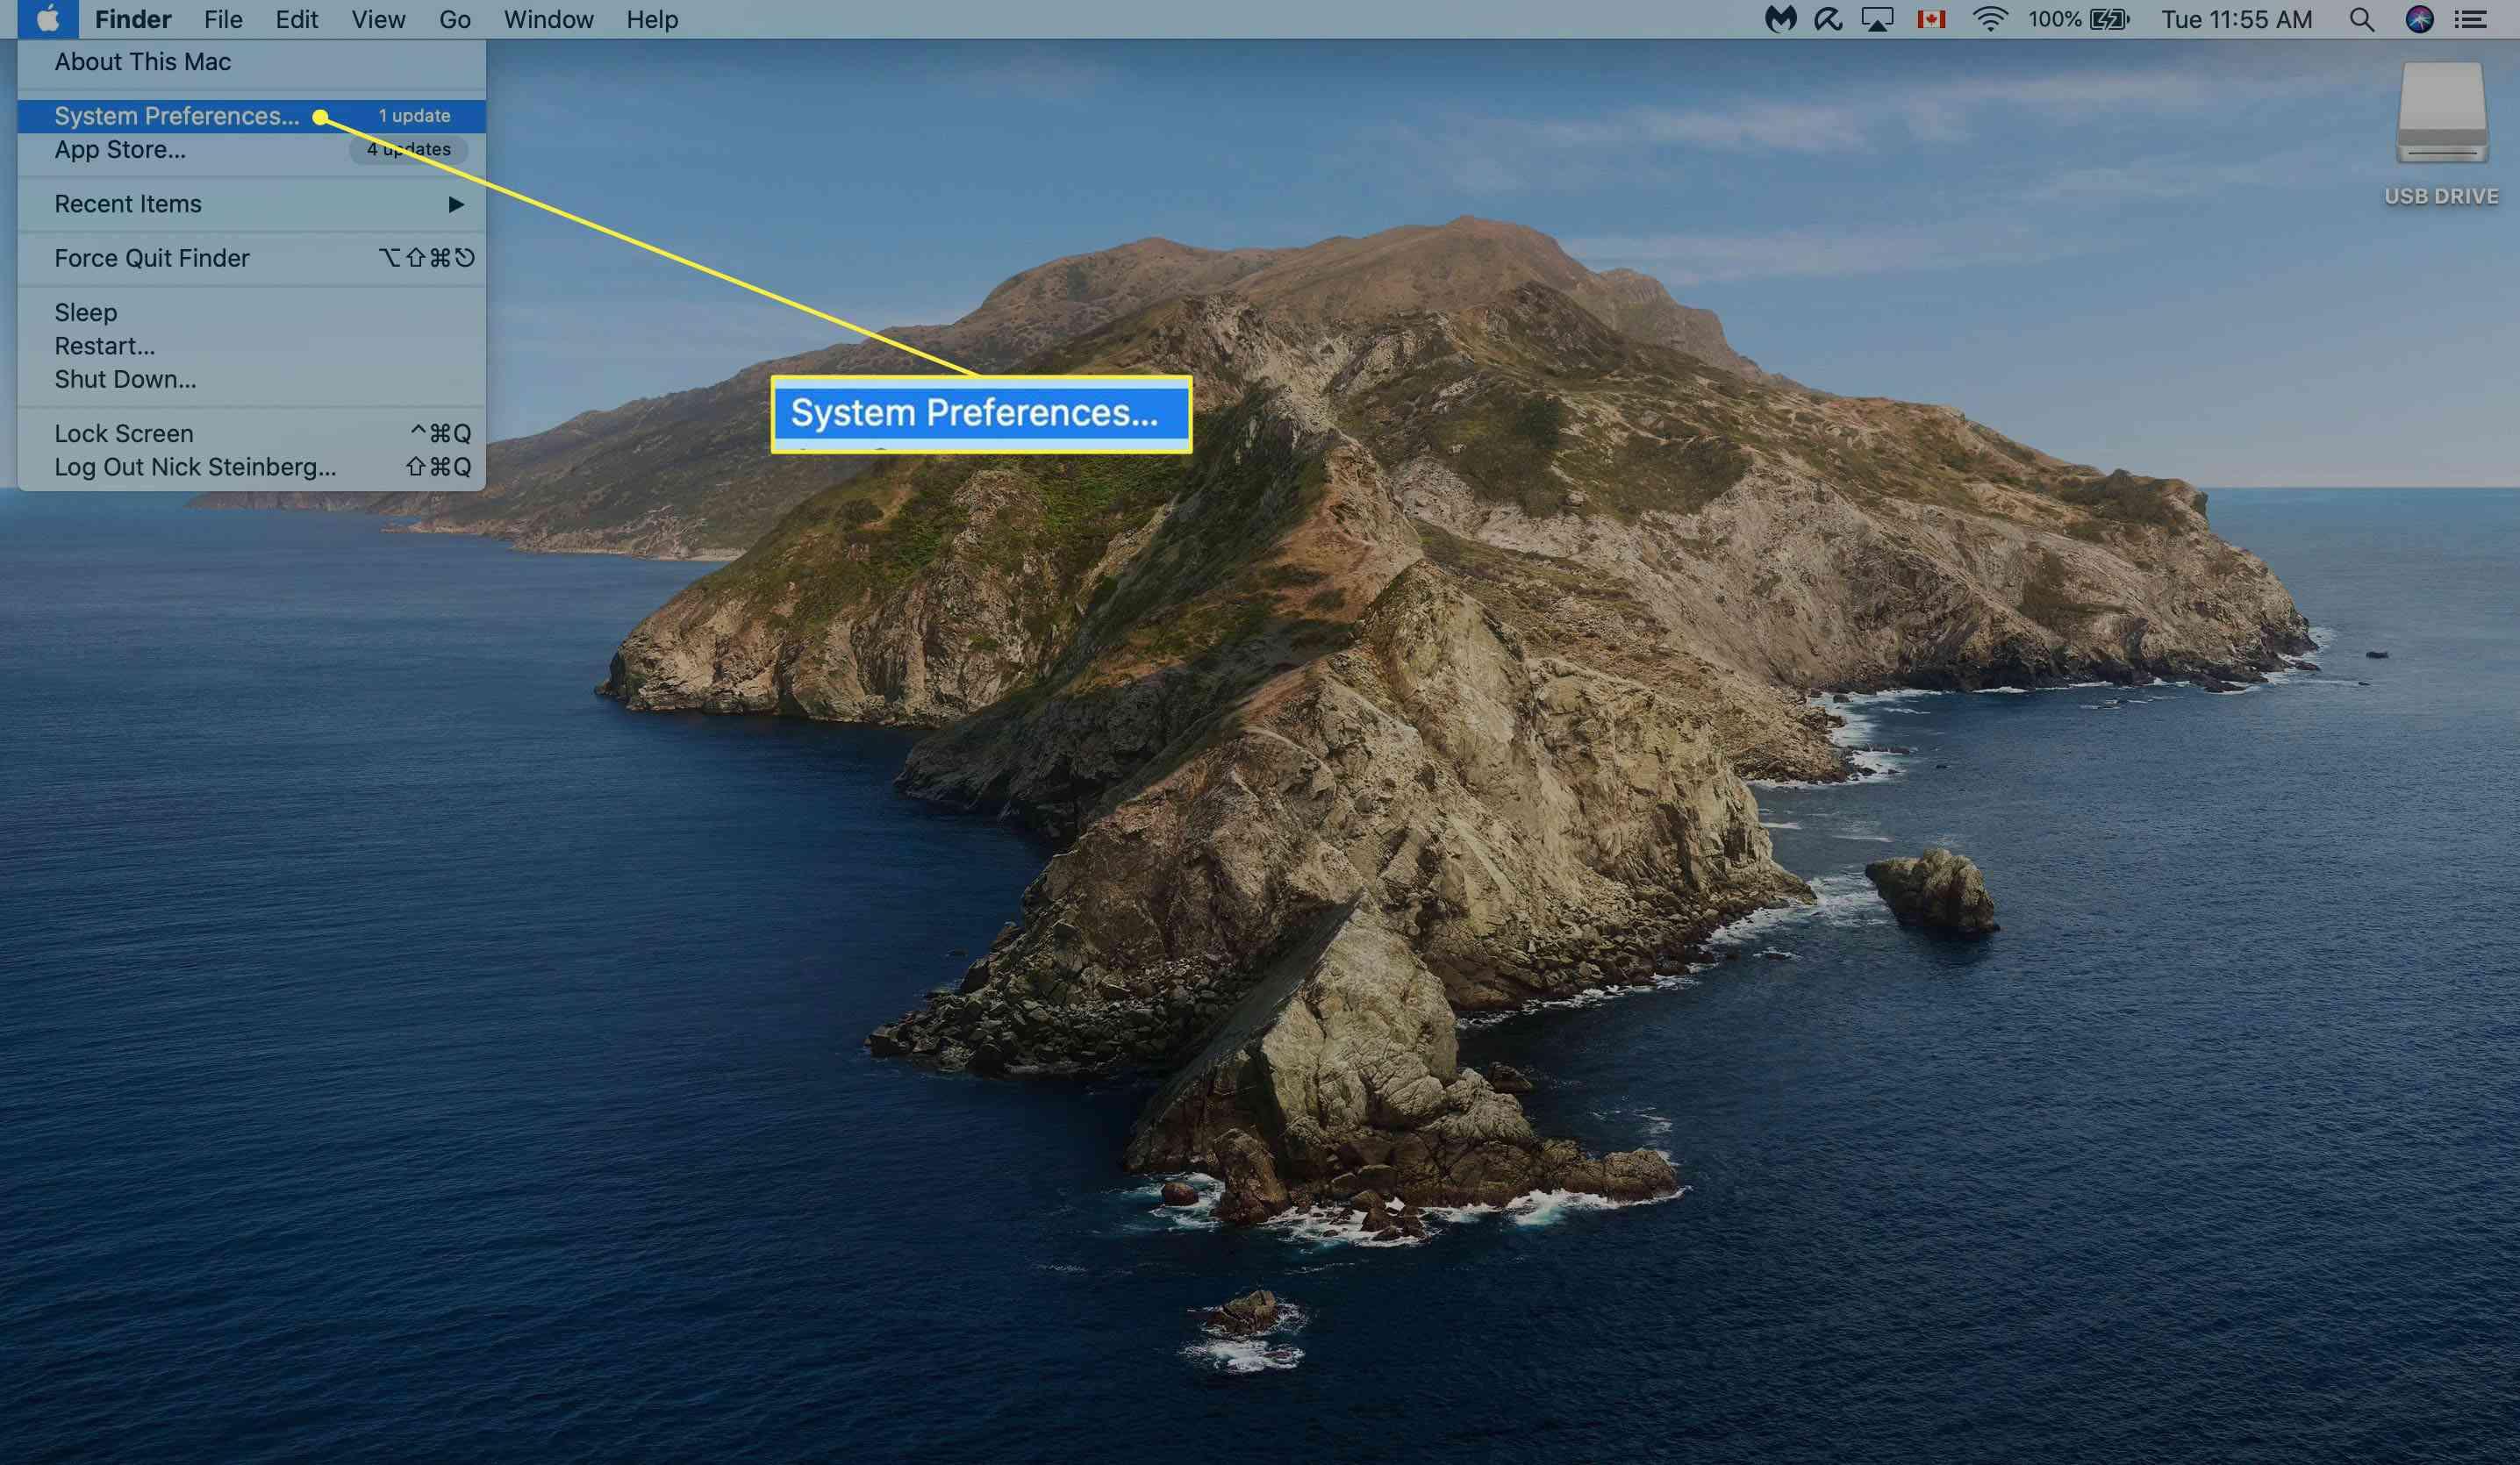 Opening System Preferences on Mac desktop.